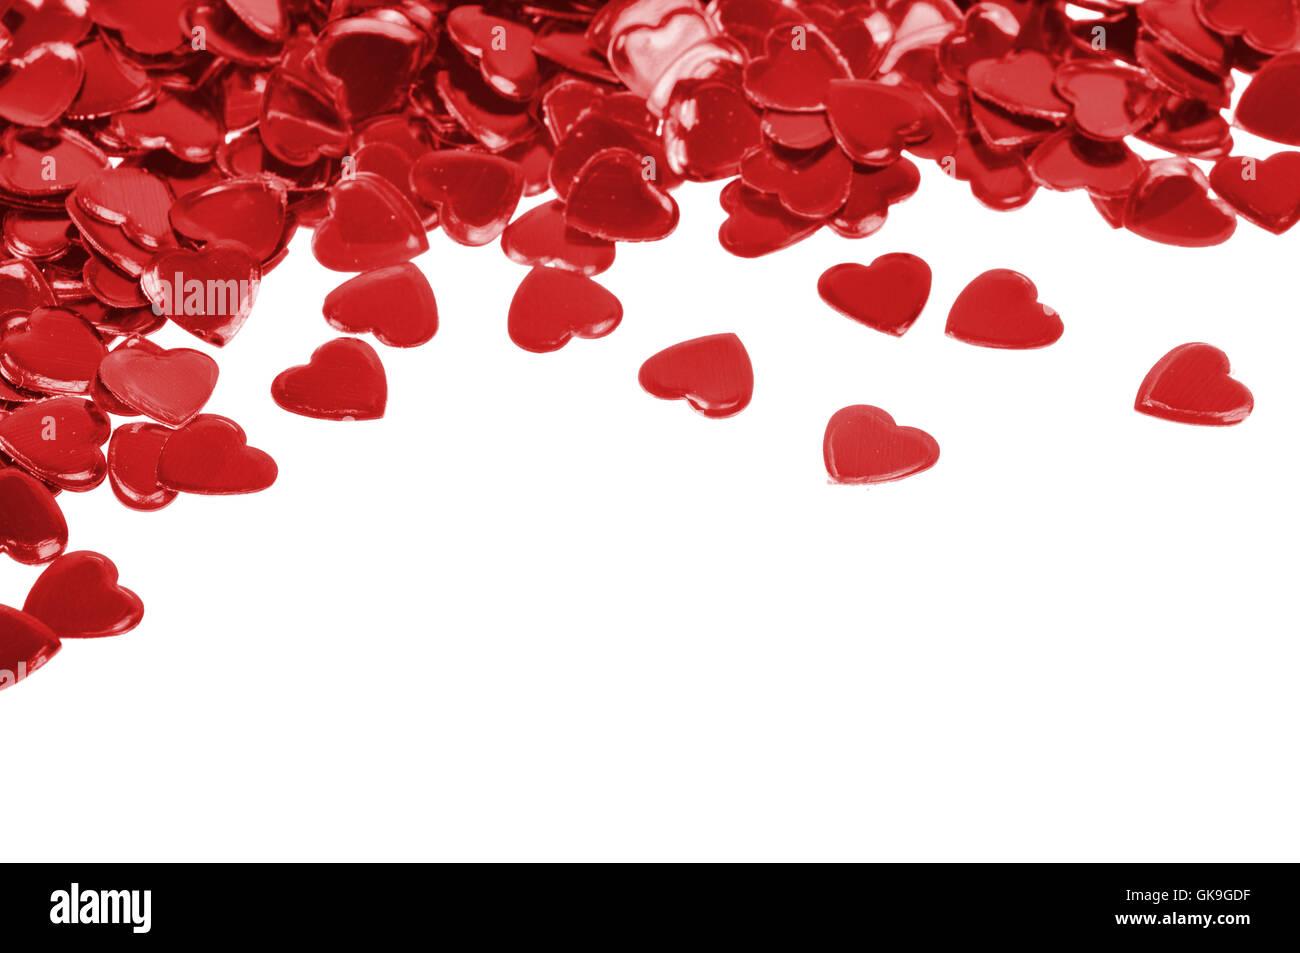 Confettis coeurs amour Photo Stock